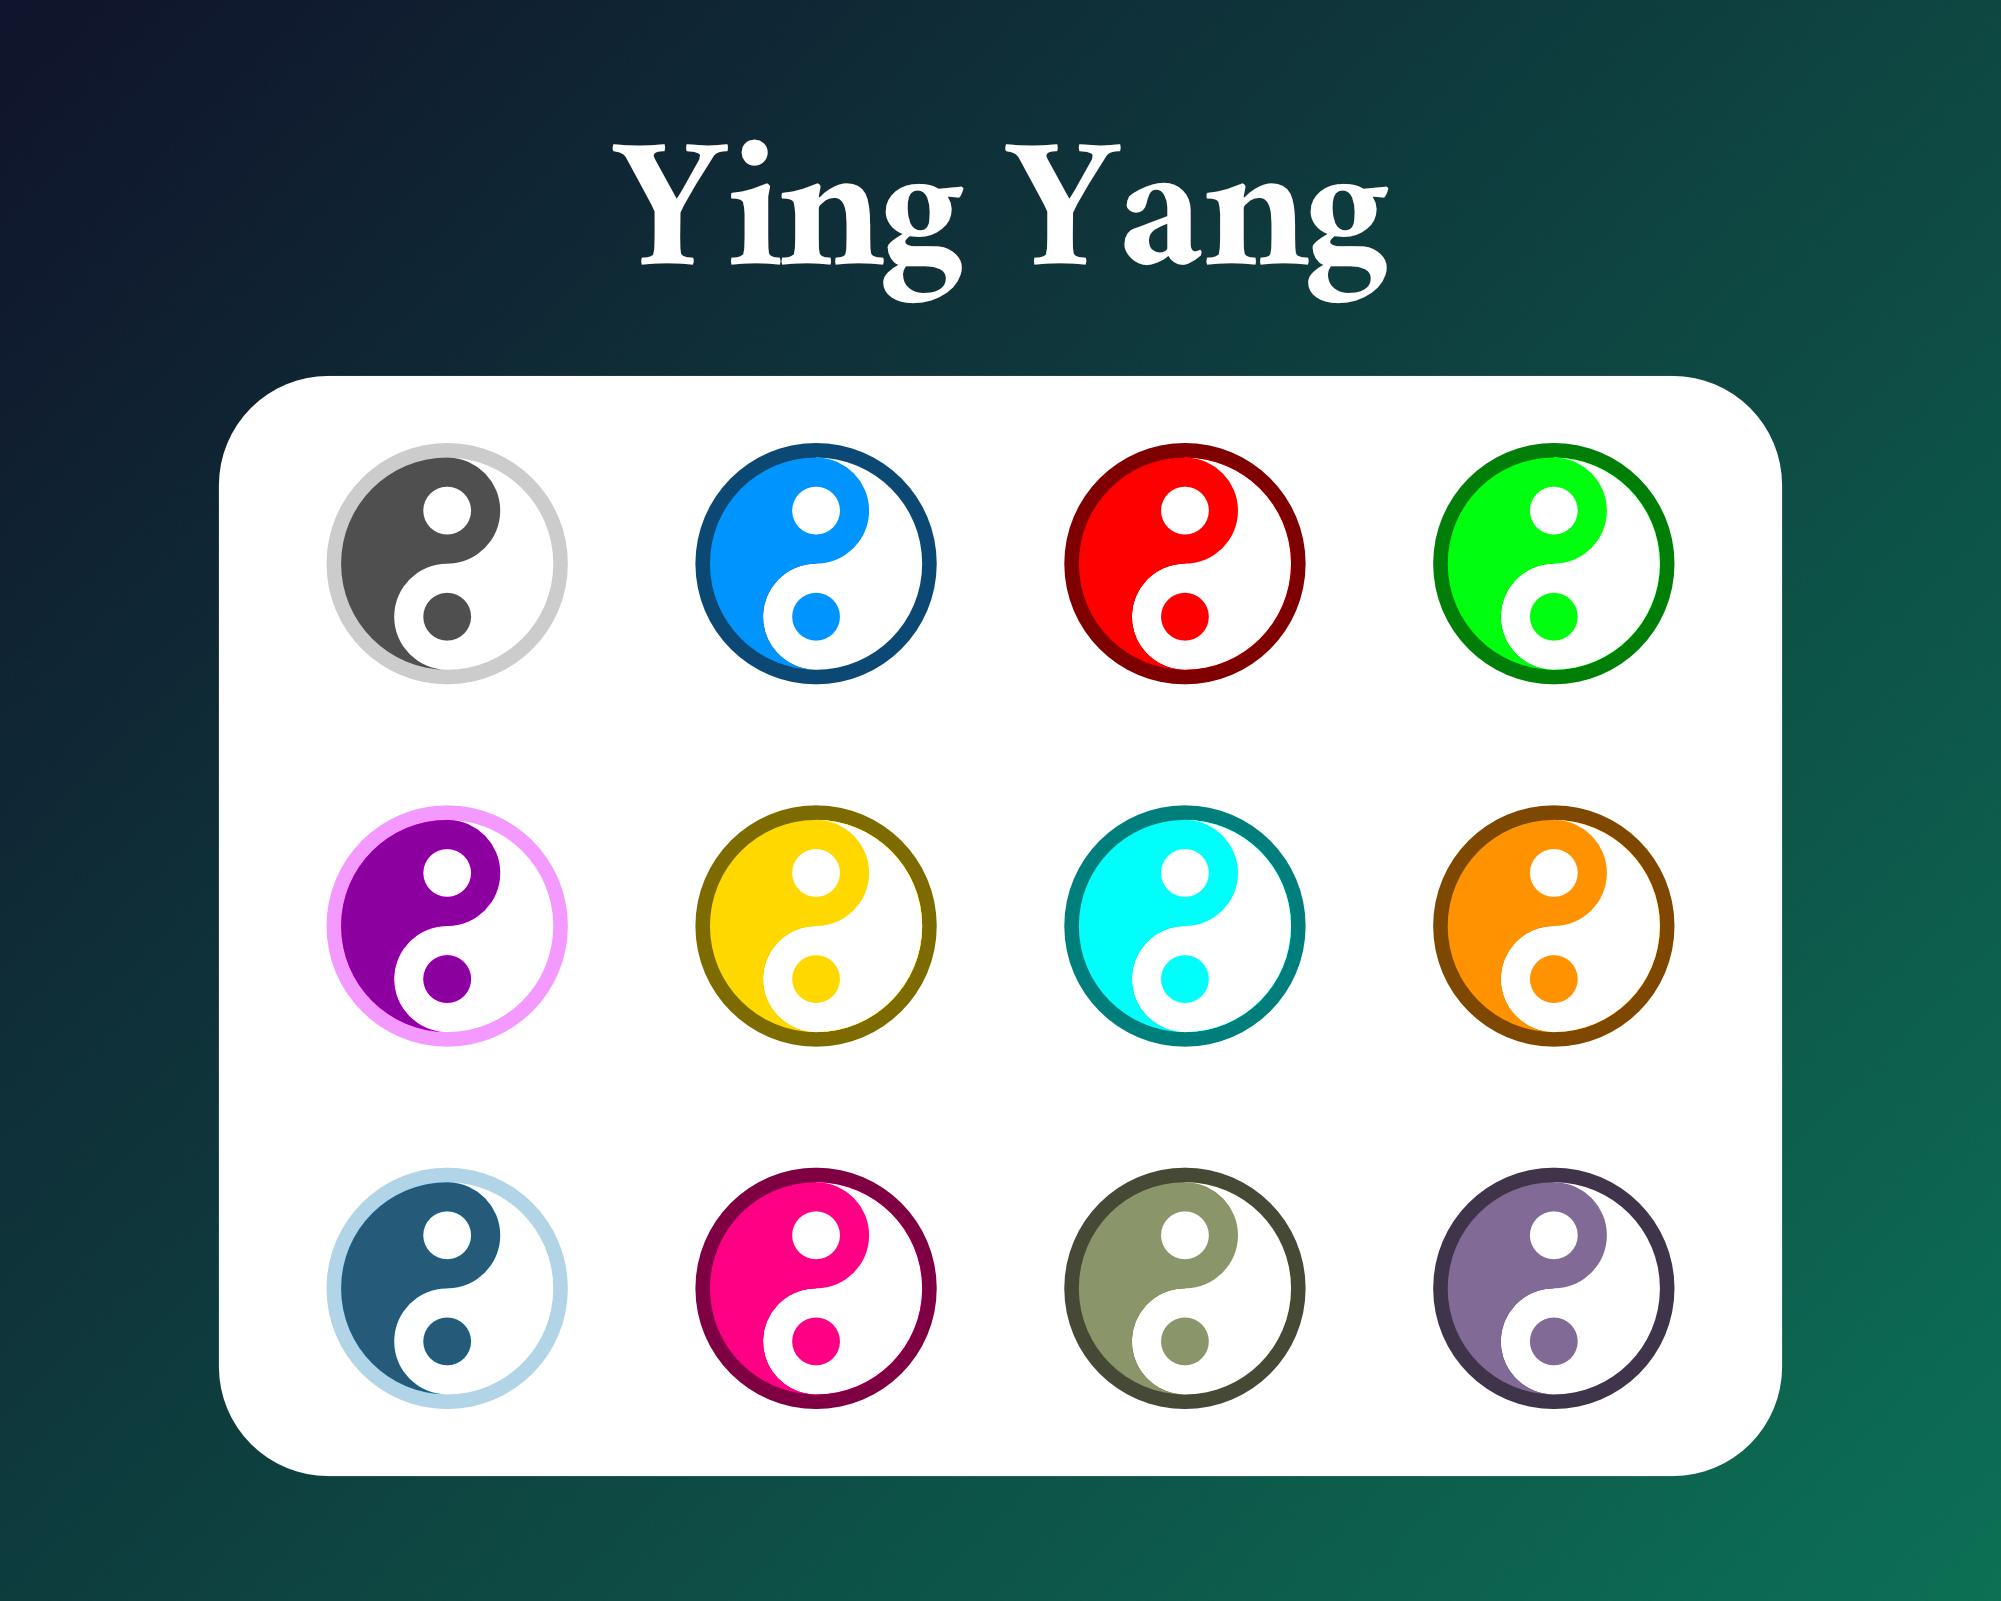 Ying Yang Sub Badges